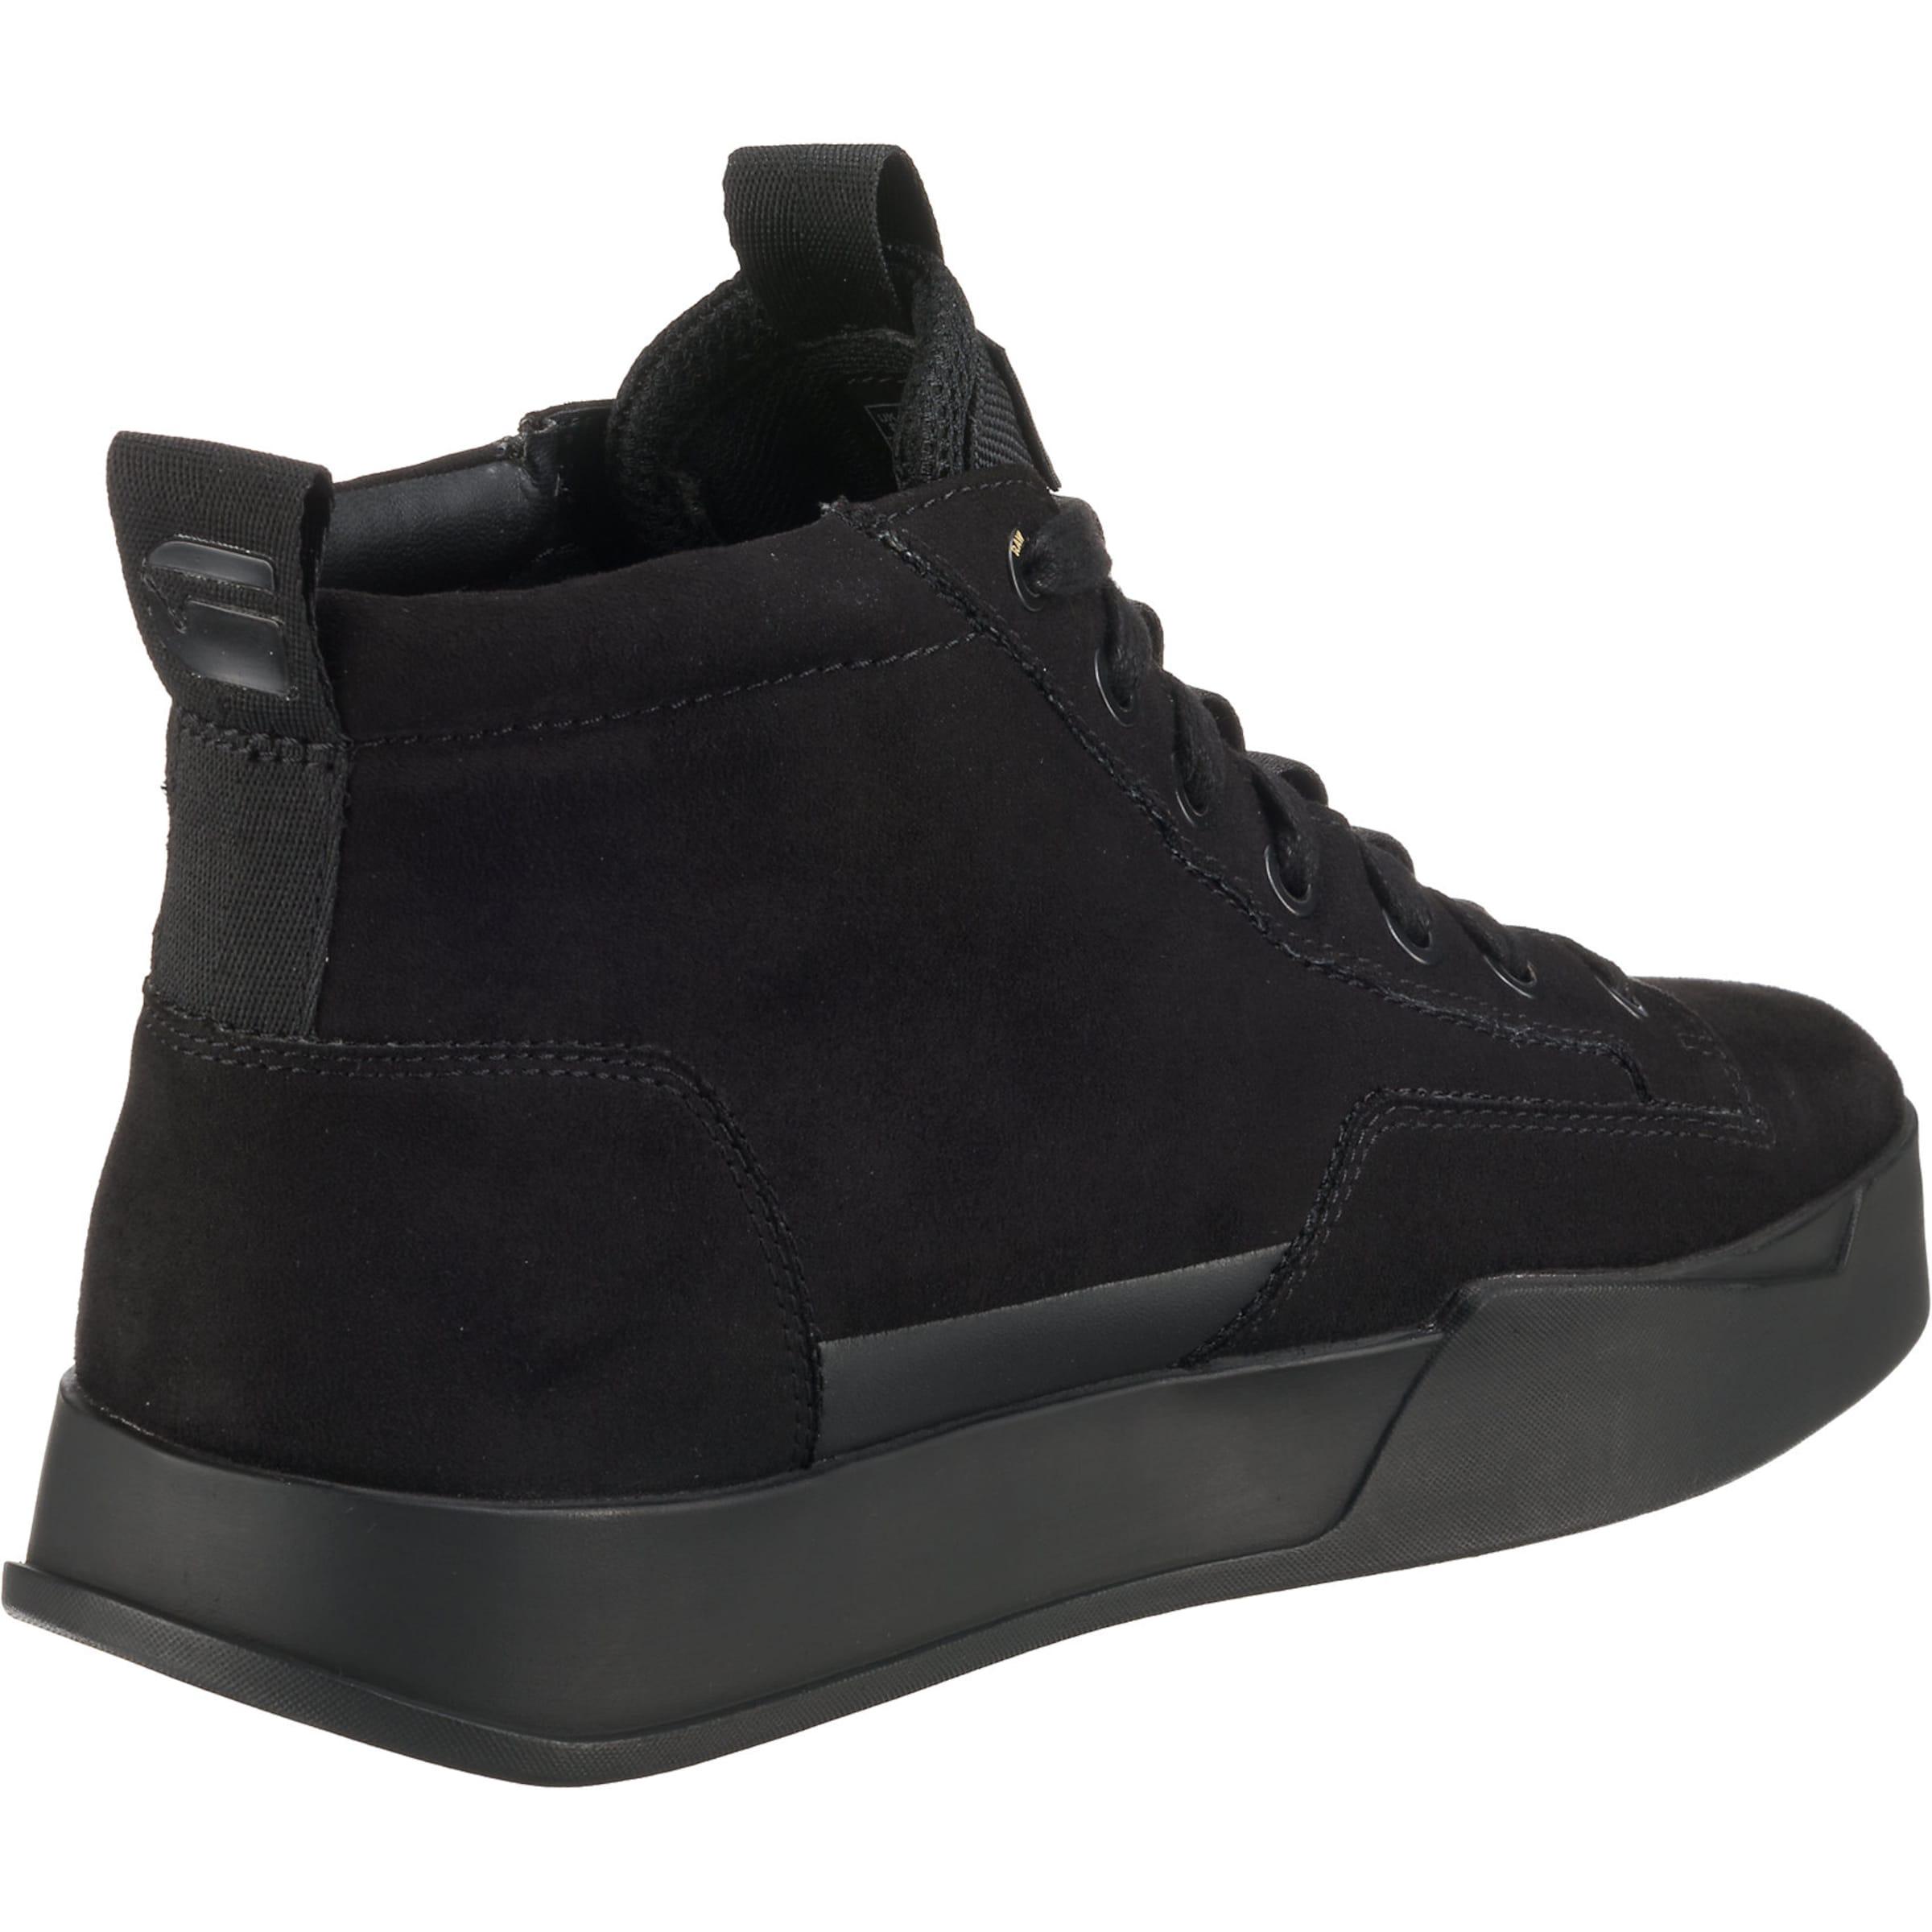 Raw Schwarz star Sneakers In G 'rackam' 3qA5LR4j